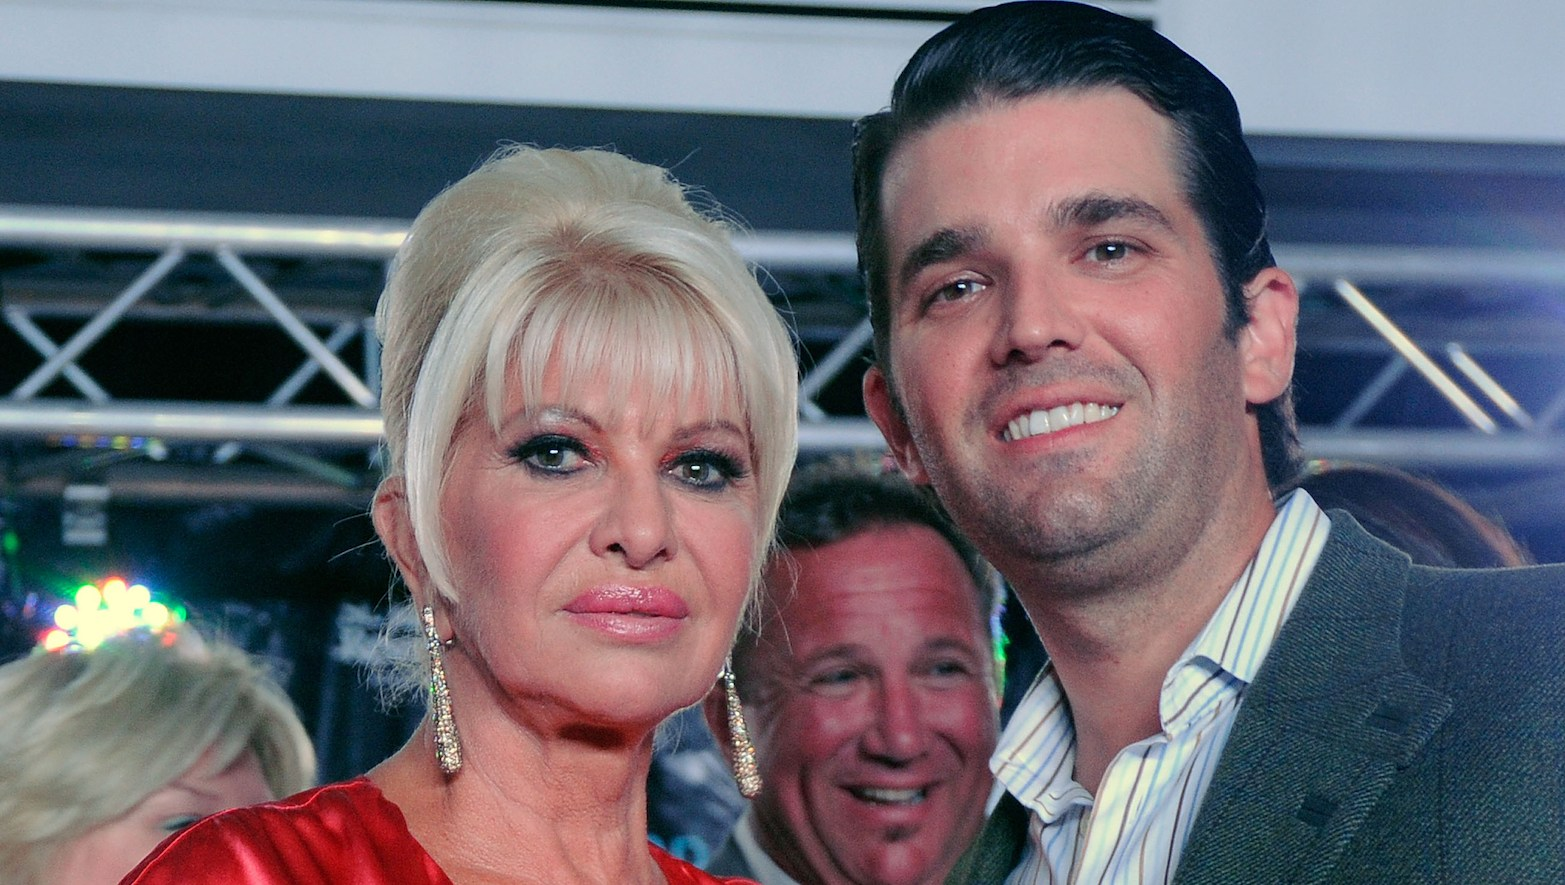 Ivana Trump and her son Donald Trump Jr.